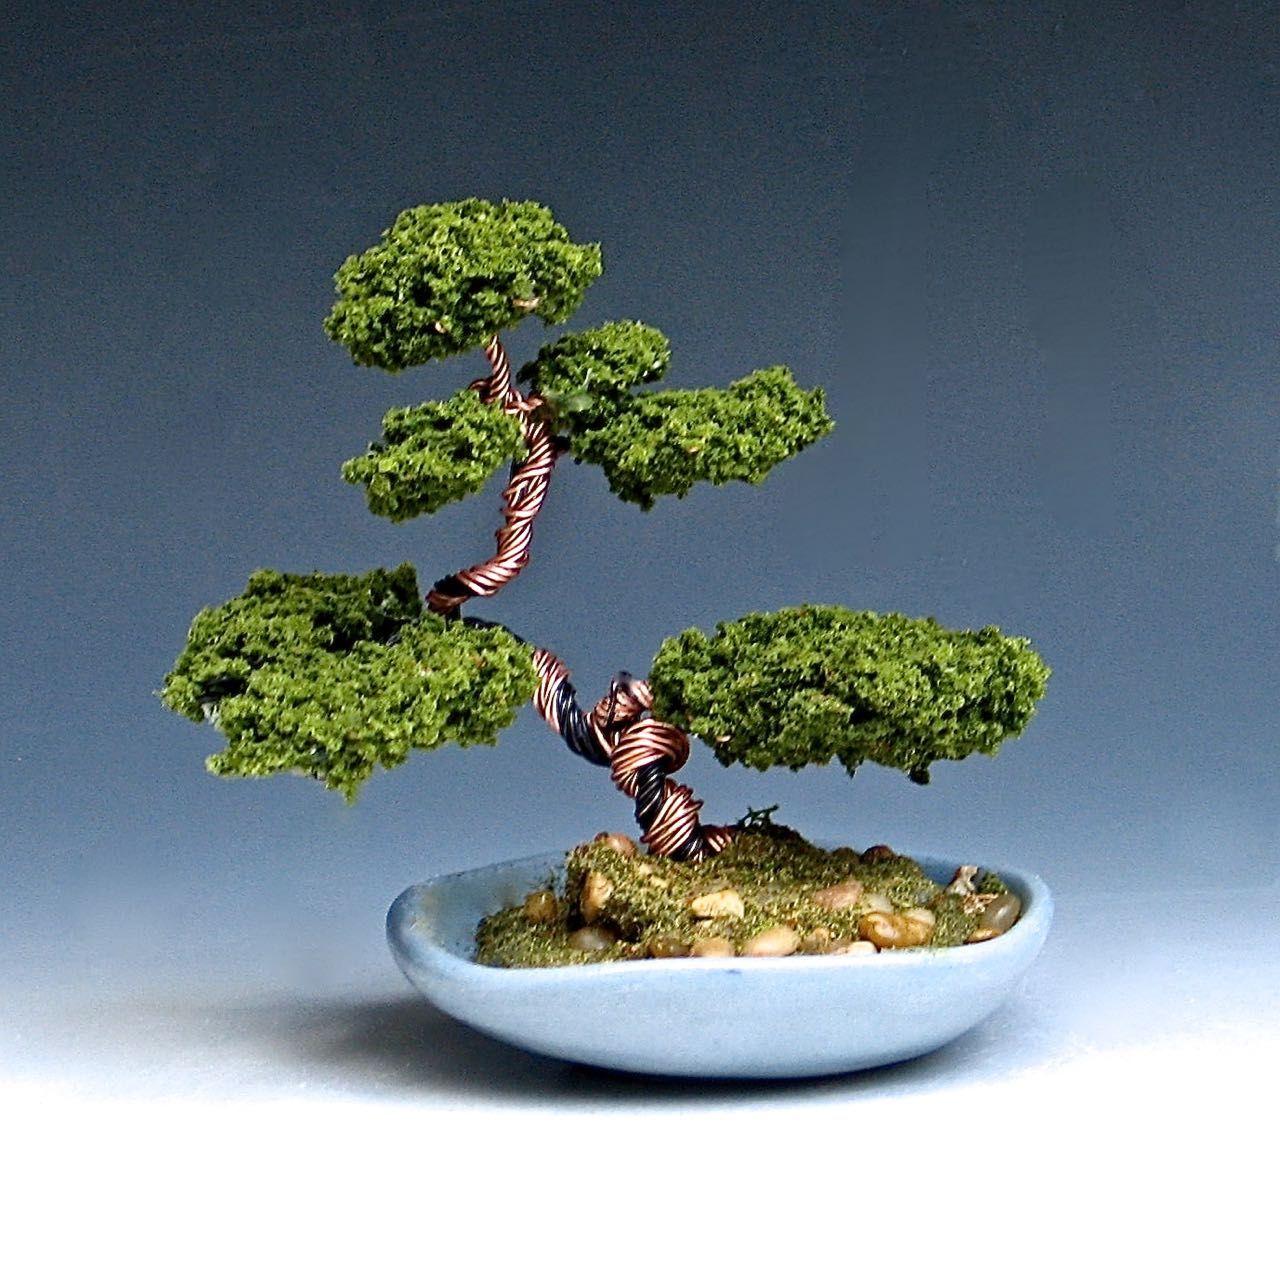 Copper wire bonsai tree; 4- inch tall sculpture in glazed ceramic ...